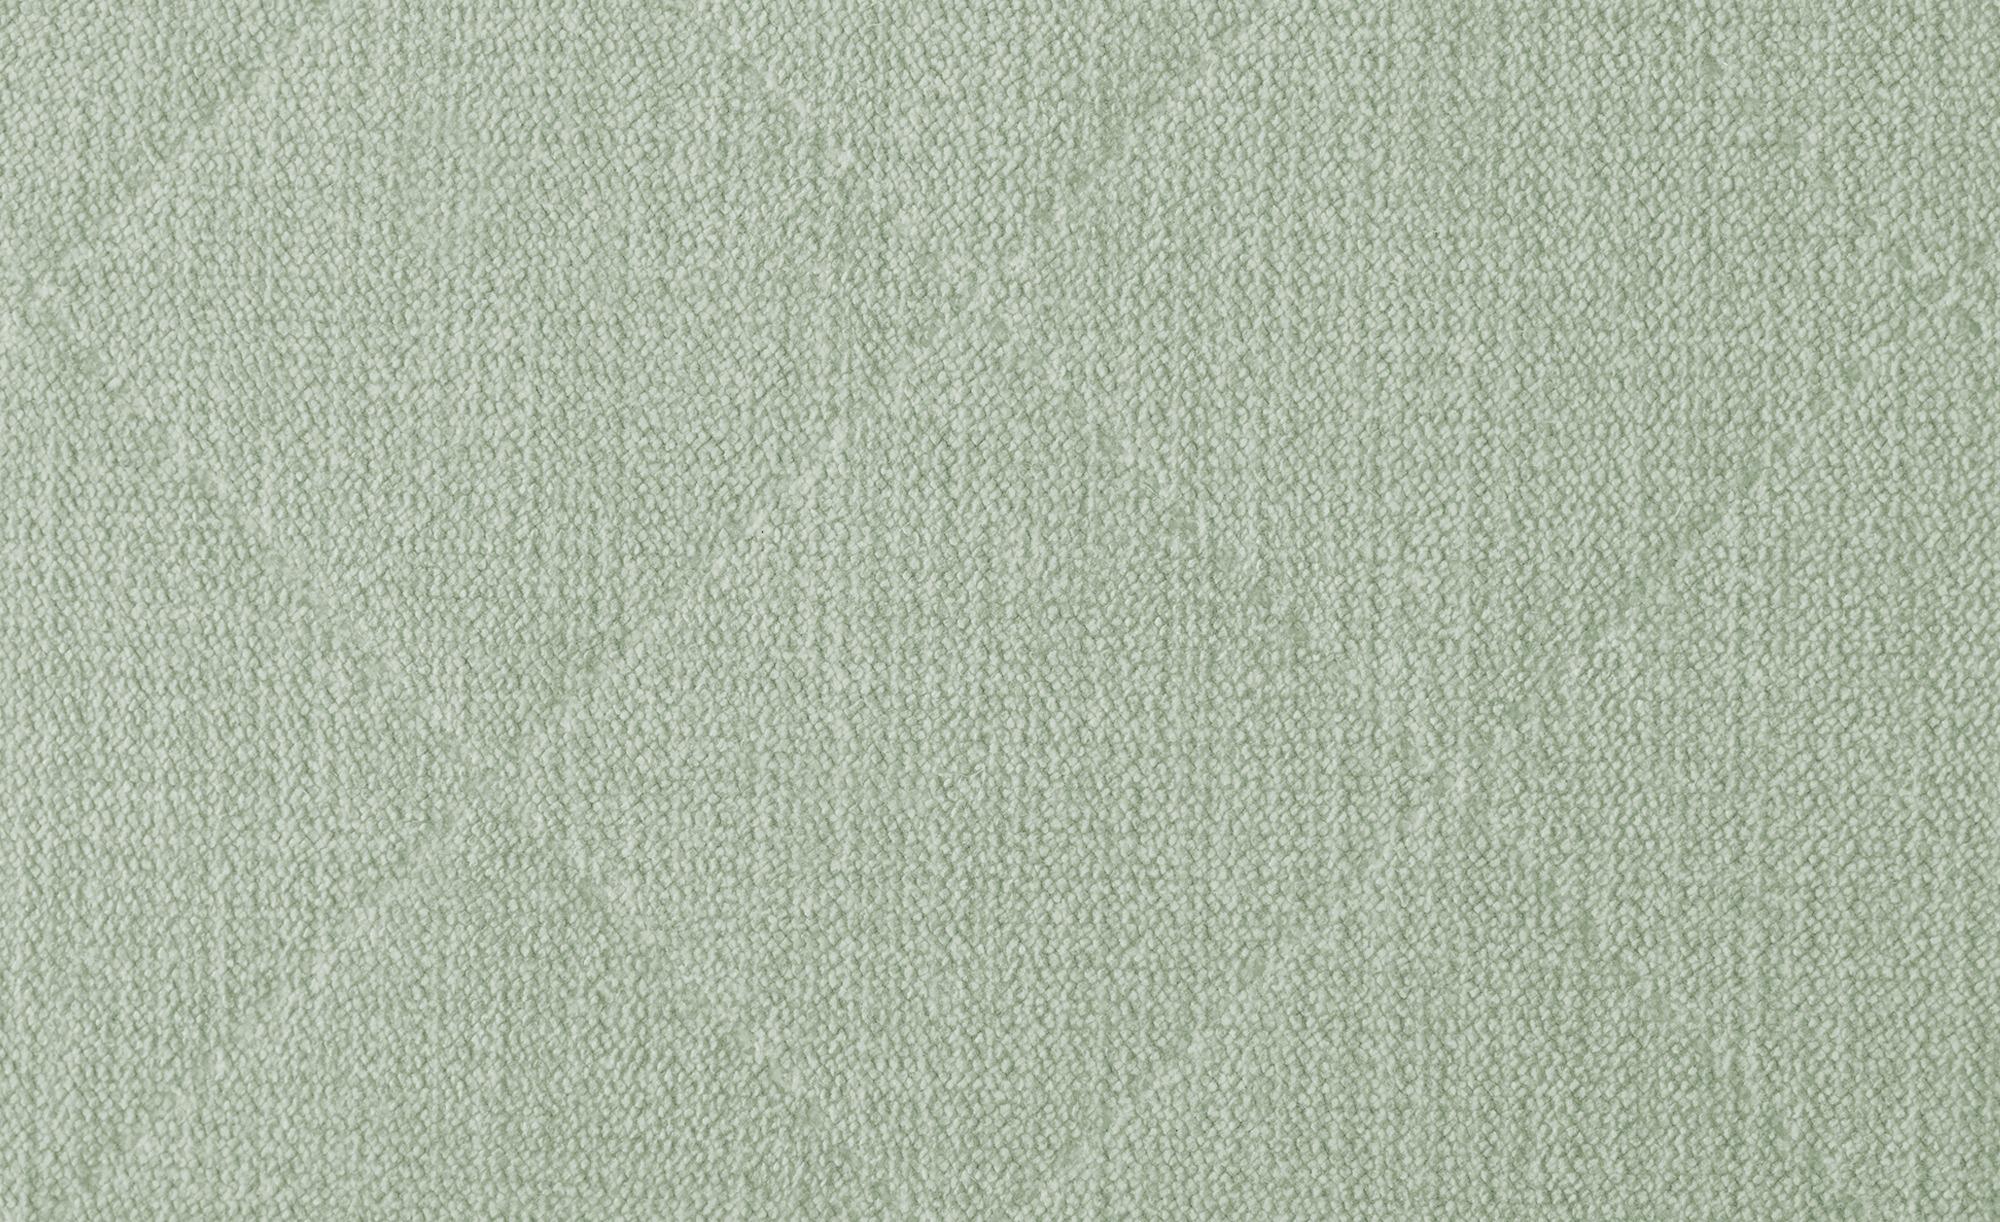 Max Schelling Sessel  Signature ¦ grün ¦ Maße (cm): B: 78 H: 79 T: 88 Polstermöbel > Sessel > Polstersessel - Höffner